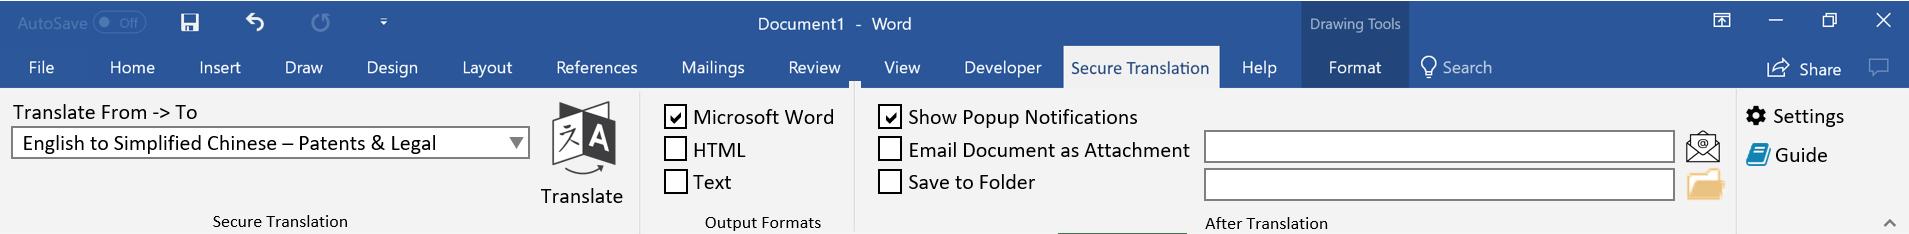 Microsoft Office Ribbon Bar